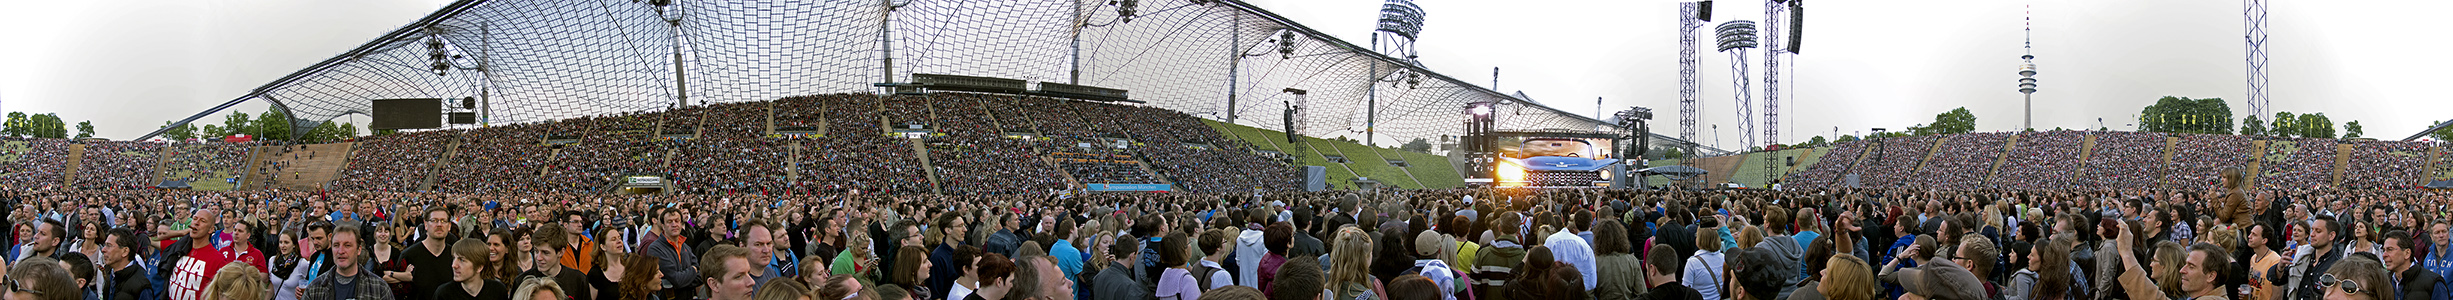 München Olympiastadion: Bon Jovi